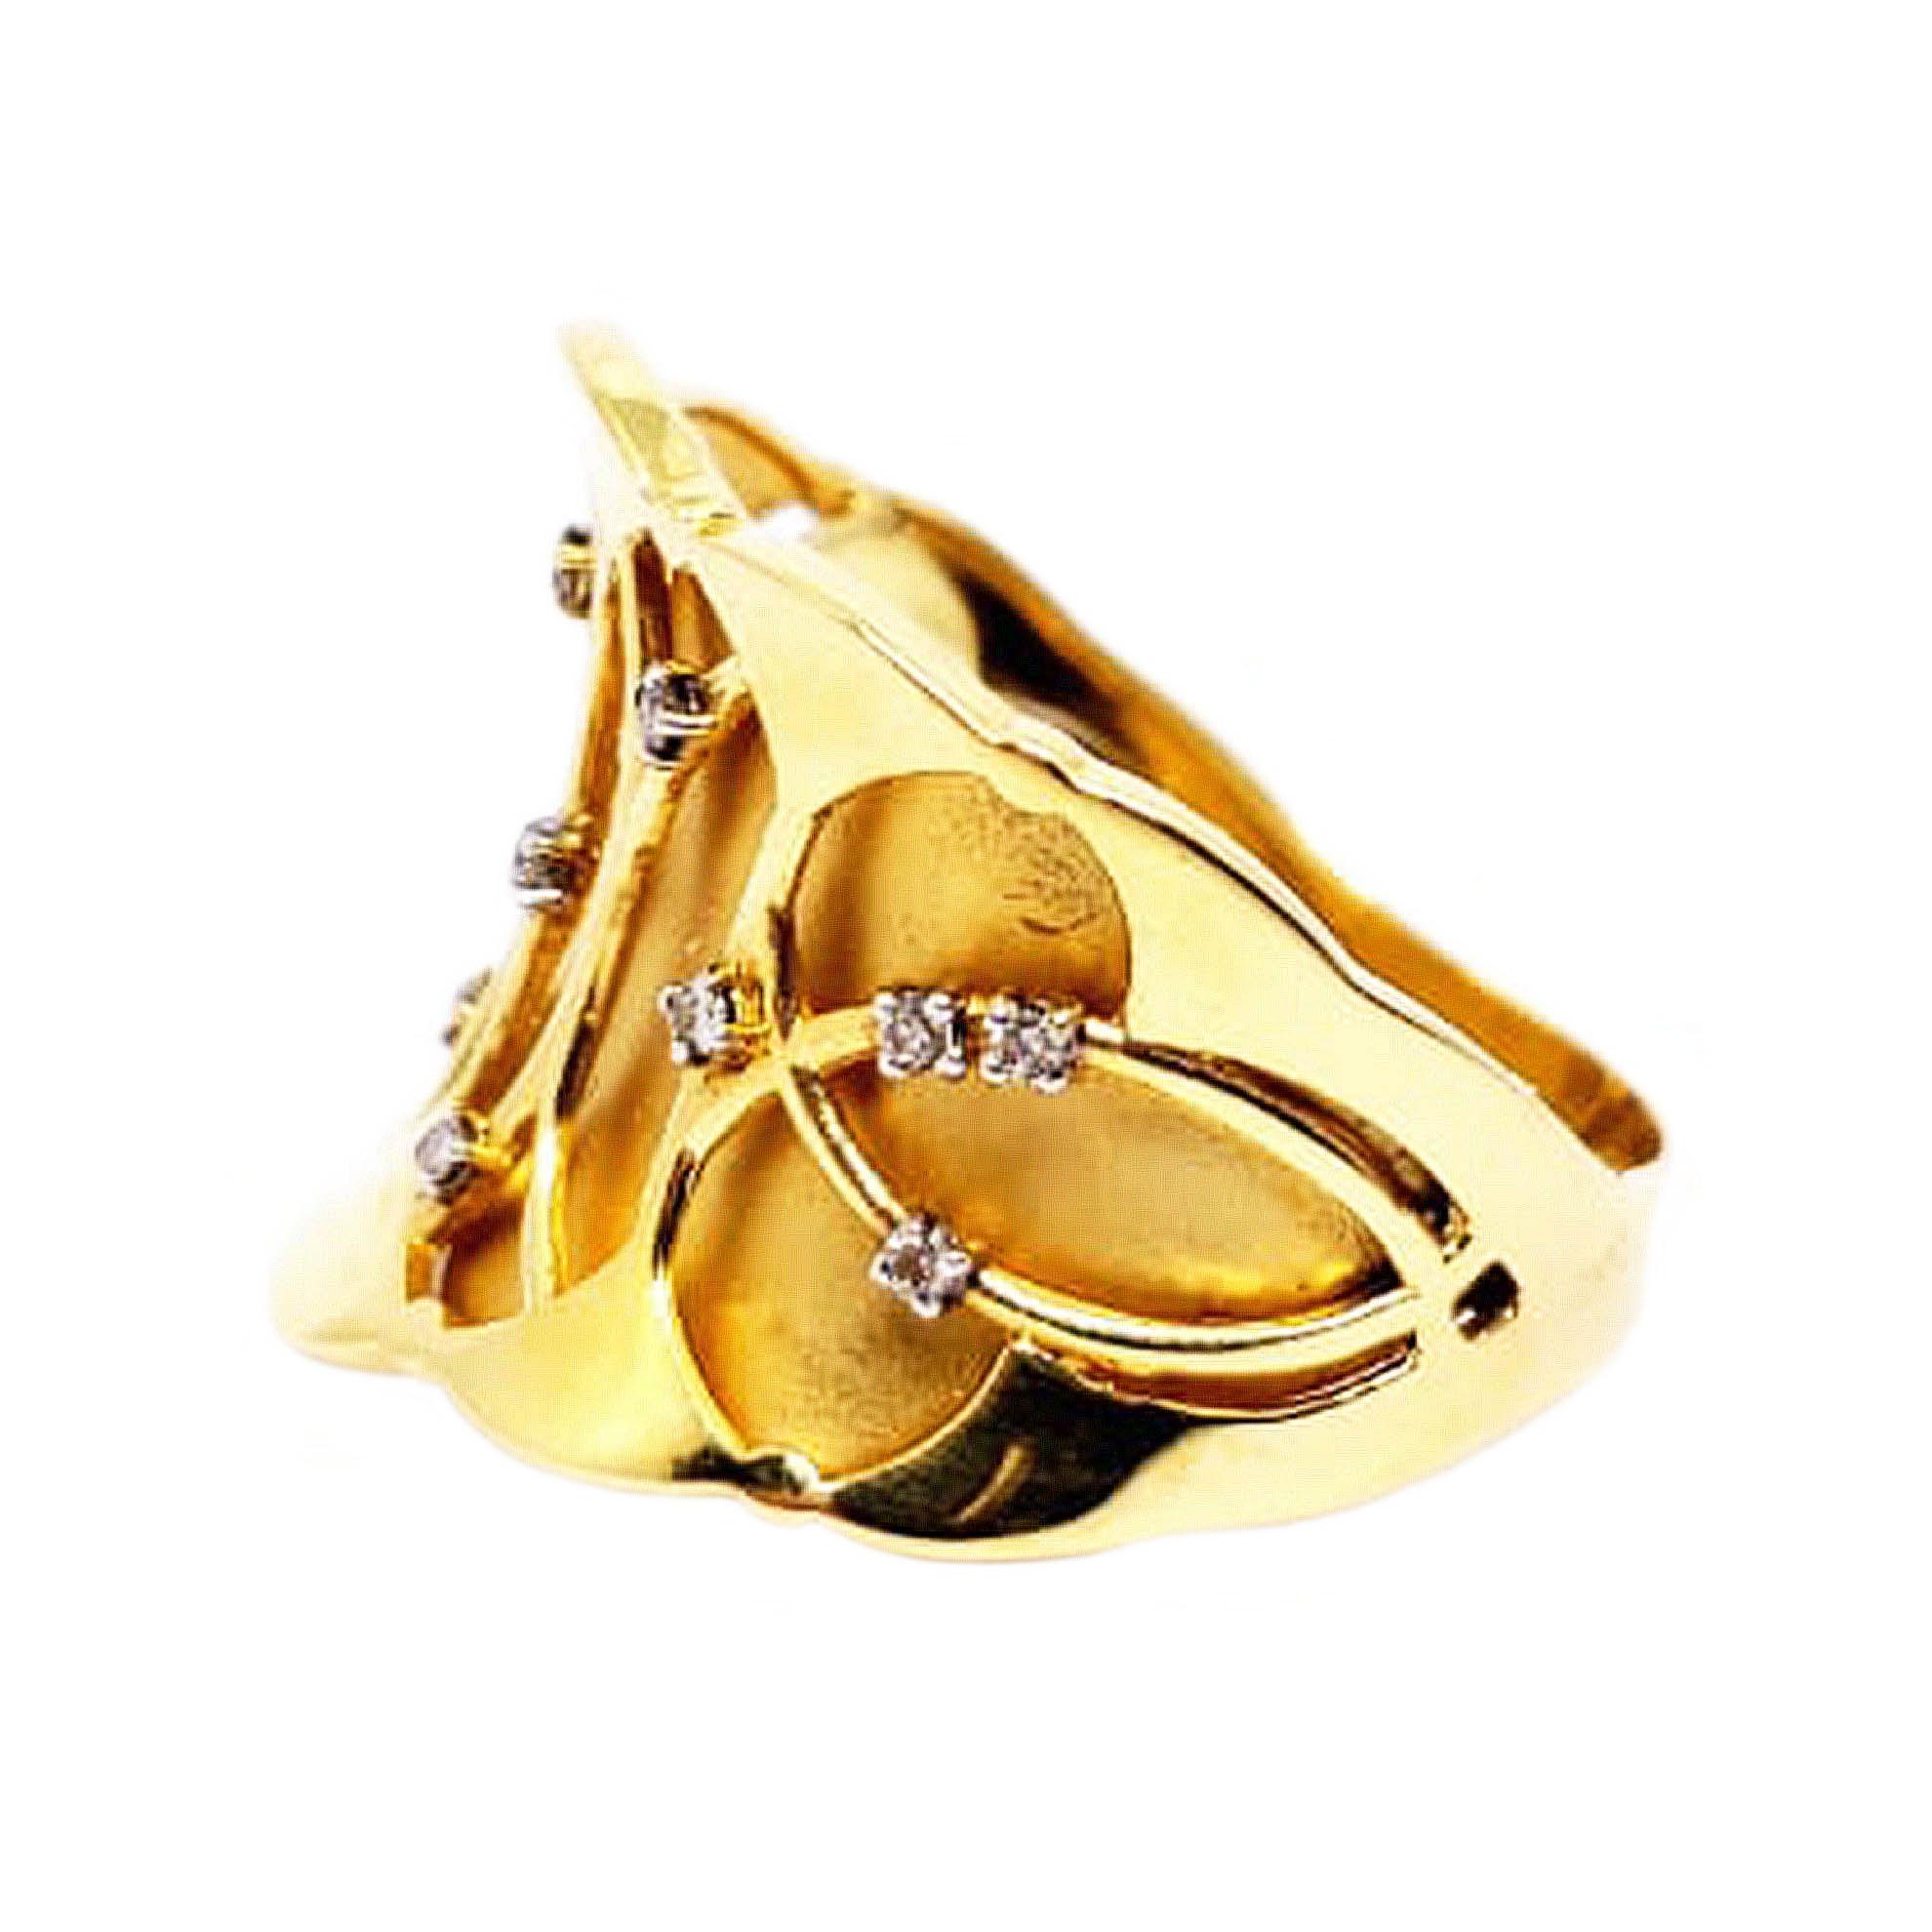 Anel c/ Diamantes e Forro Fosco em Ouro 18 Kilates